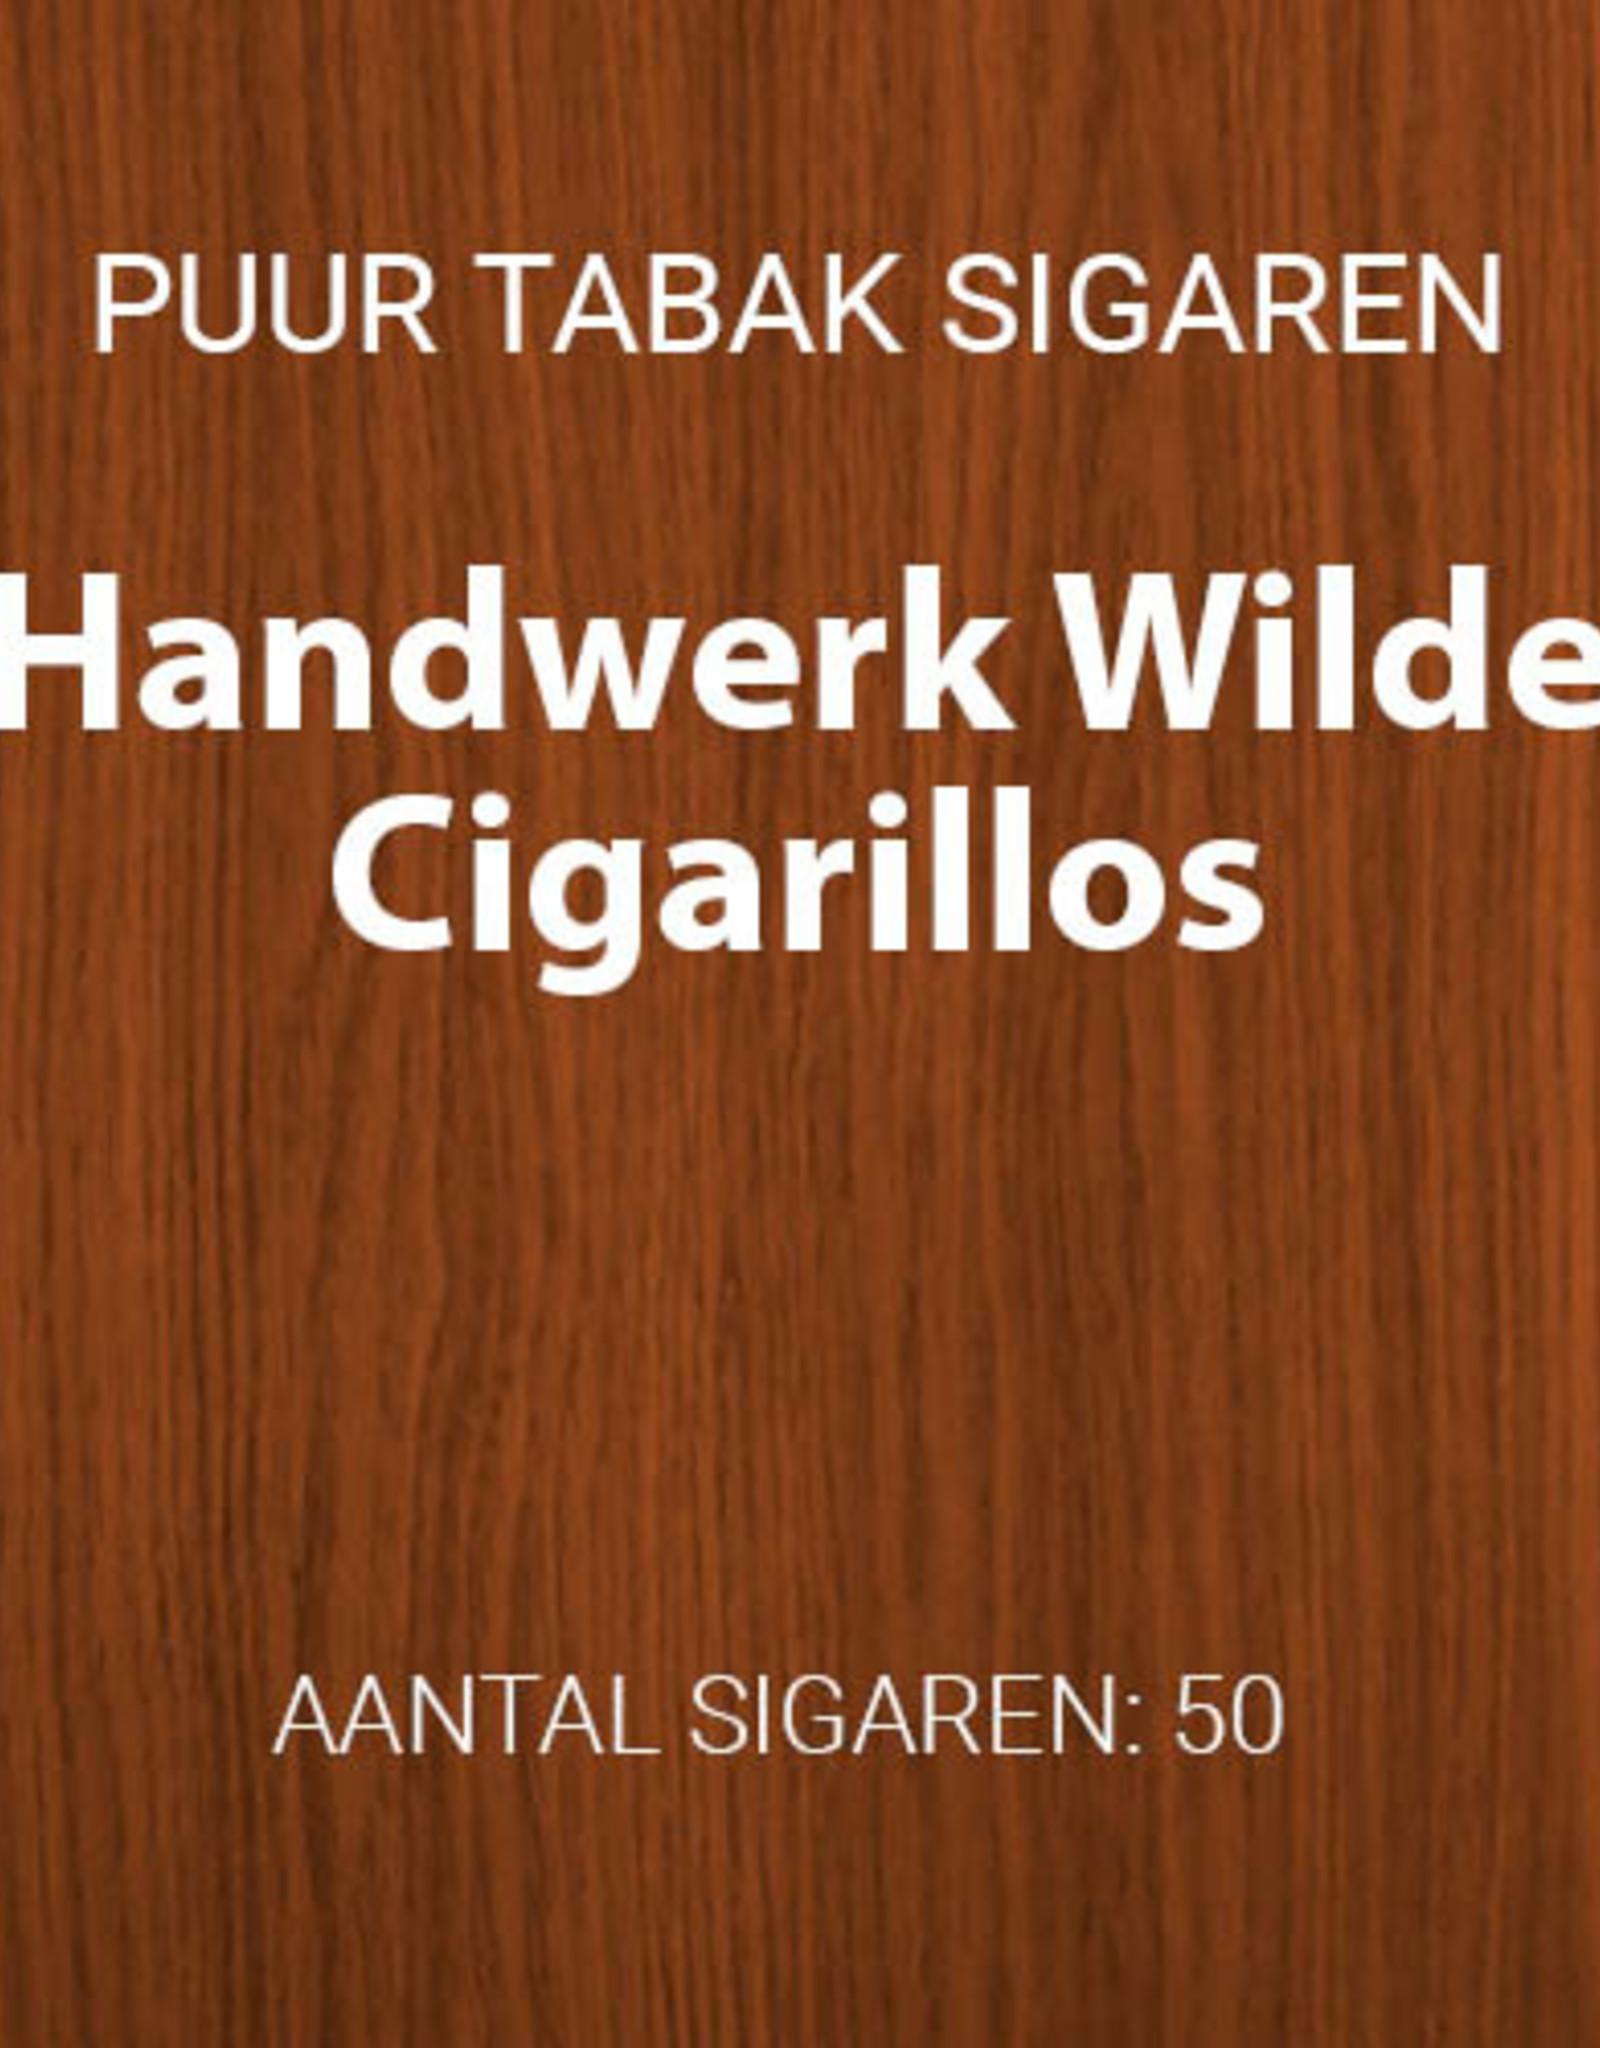 Handwerk Wilde Cigarillos 100%